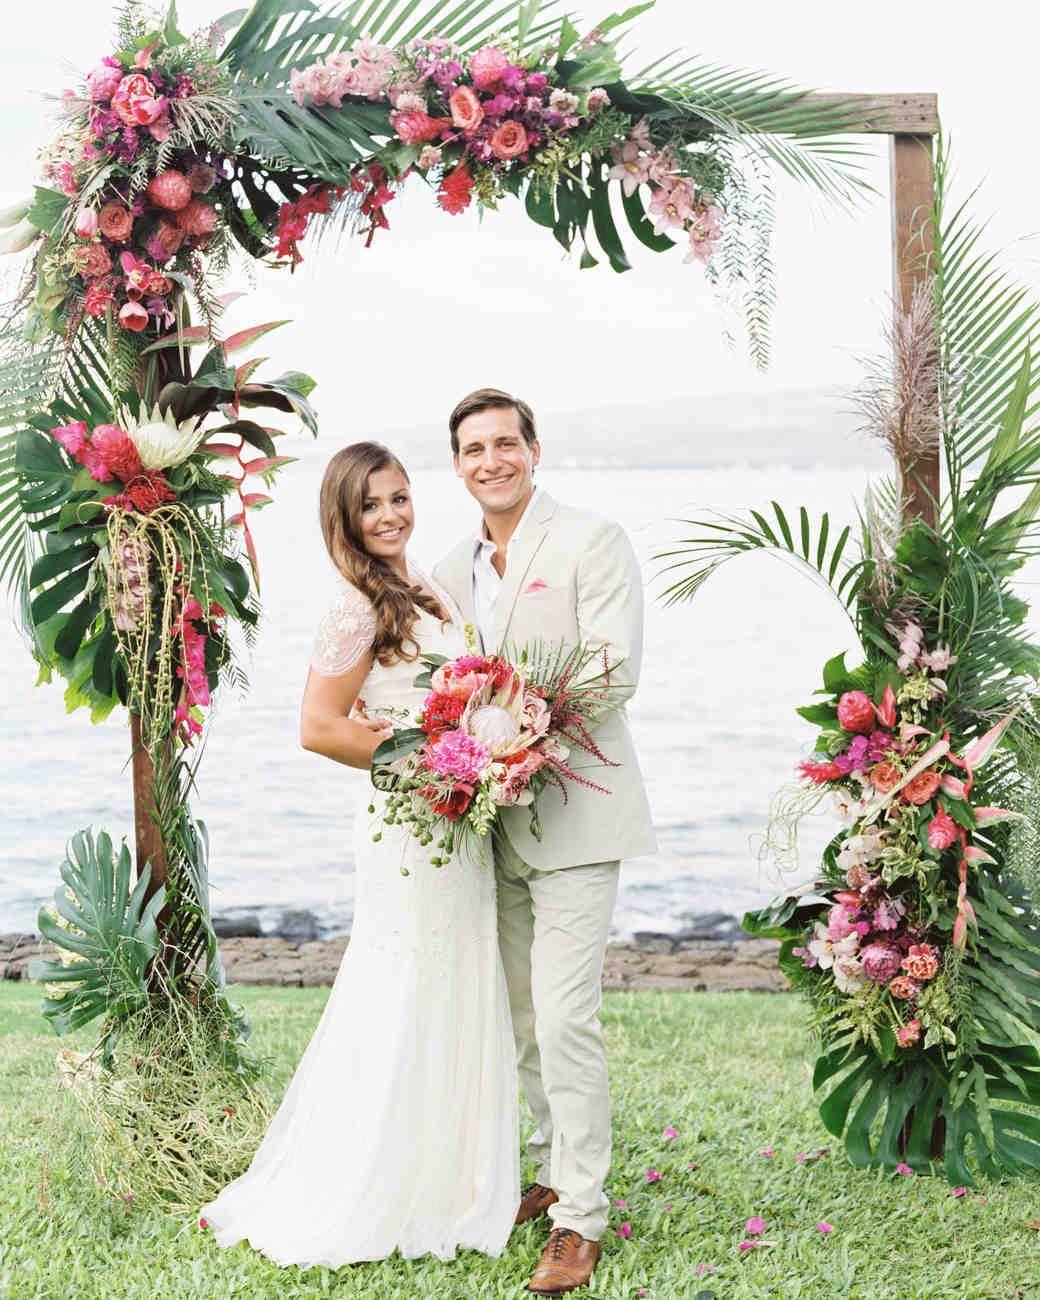 A Casual Beach Wedding In Puako Hawaii Wedding Arch Flowers Tropical Wedding Theme Hawaiian Wedding